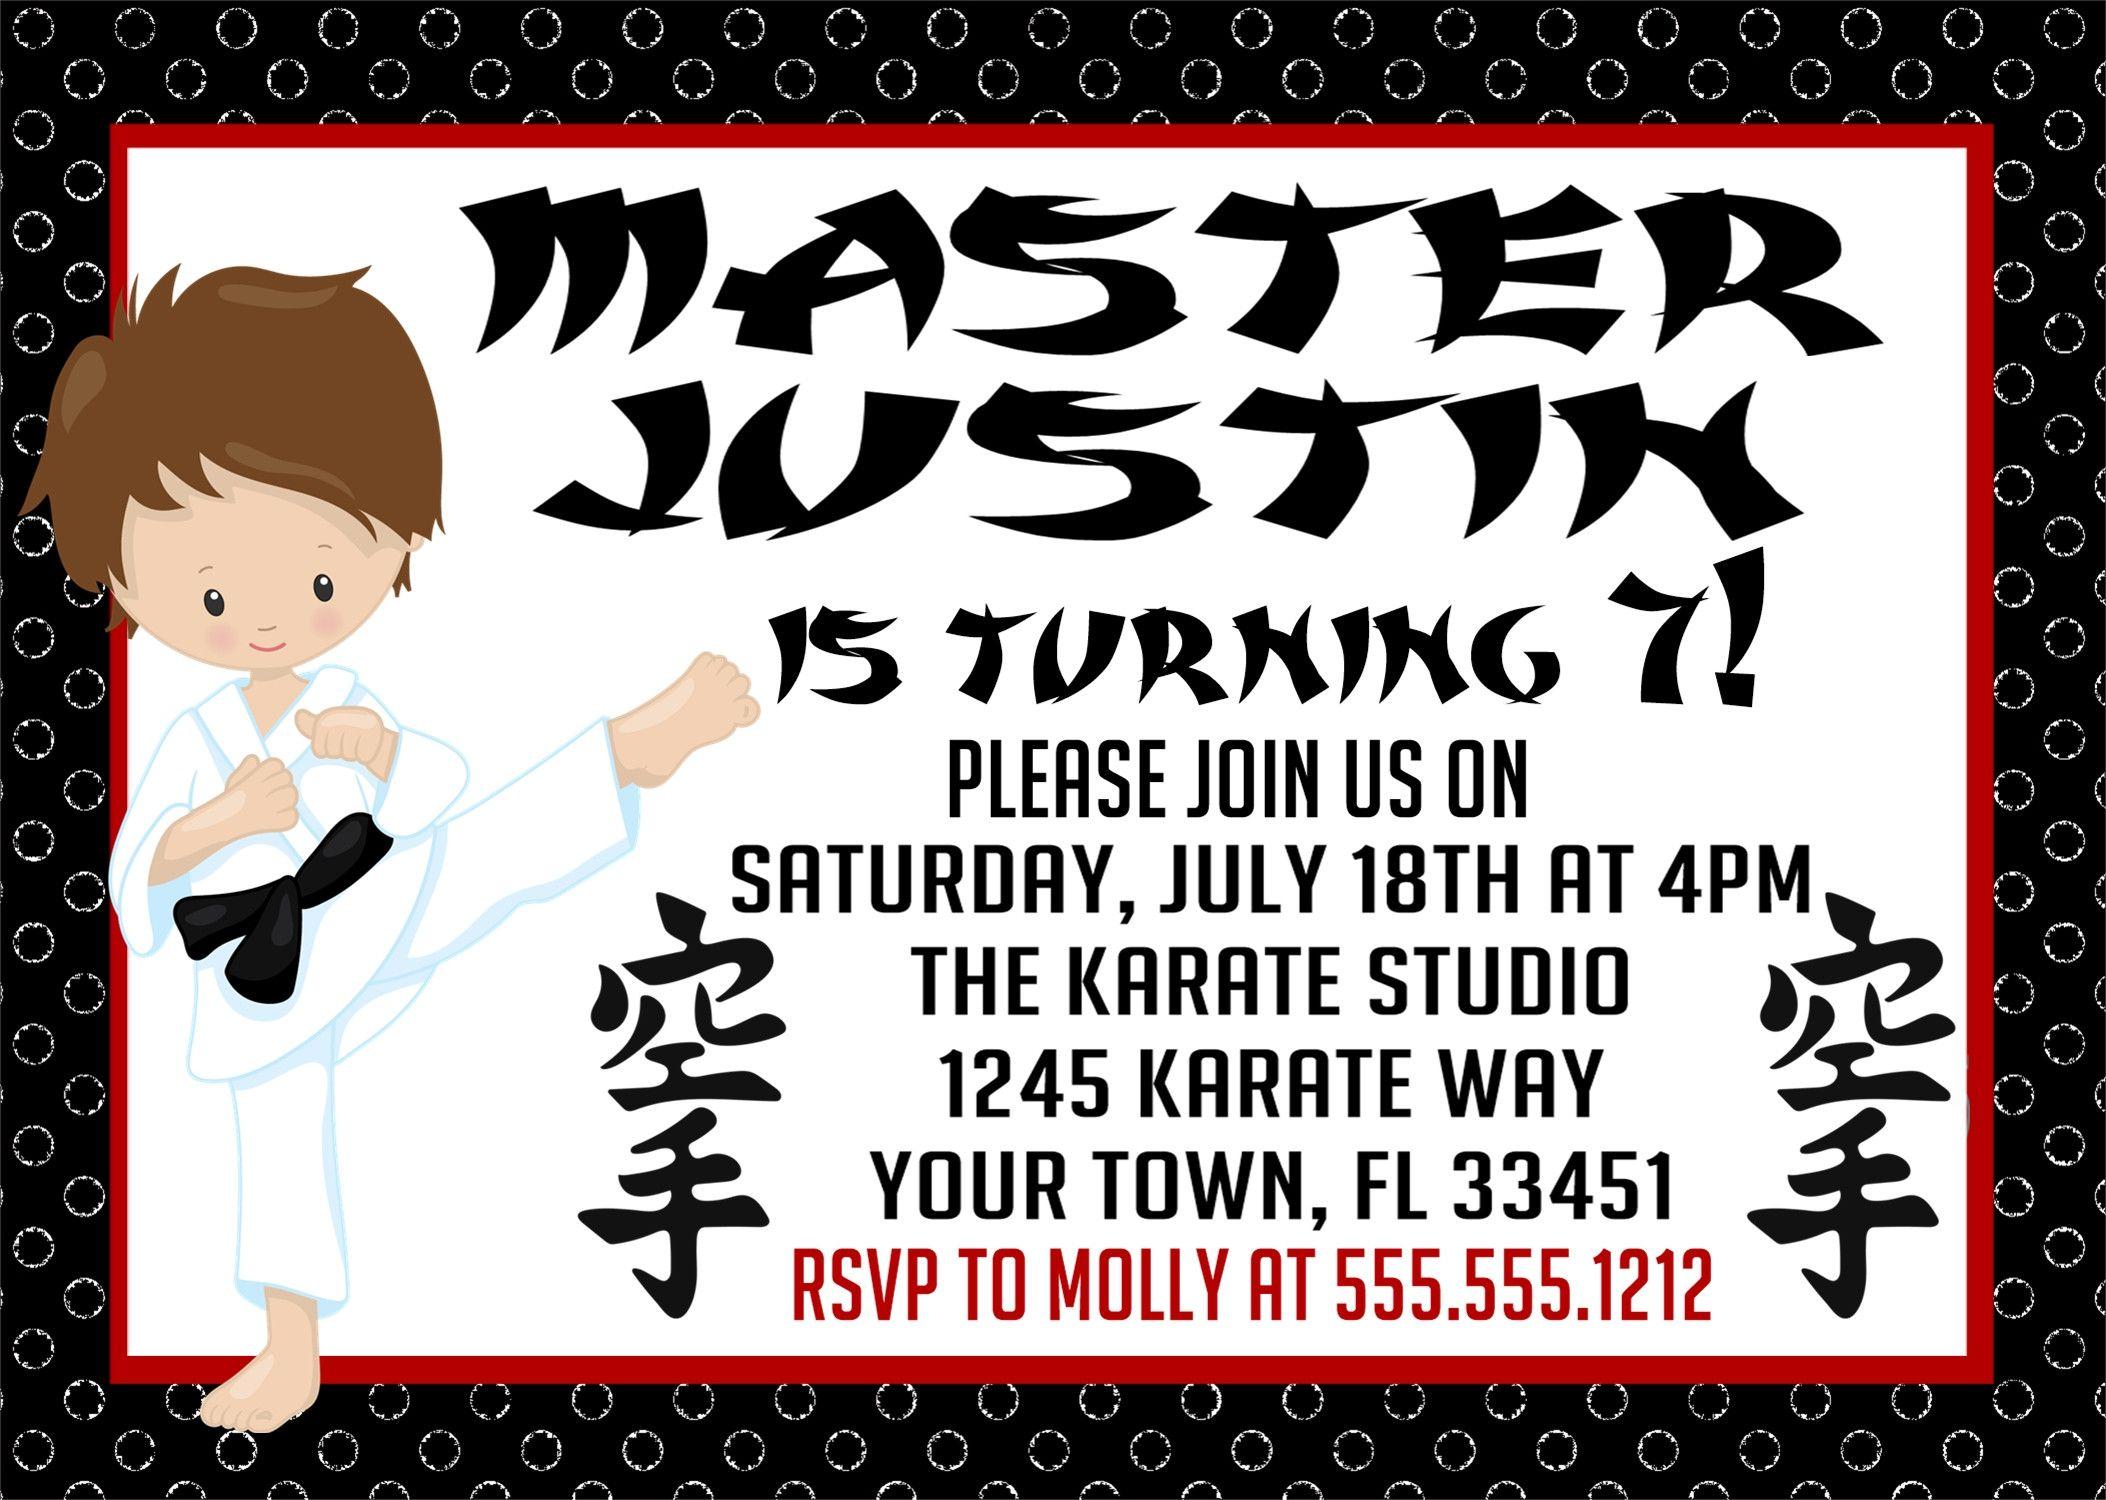 Karate Birthday Party Invitations | Karate birthday, Party ...